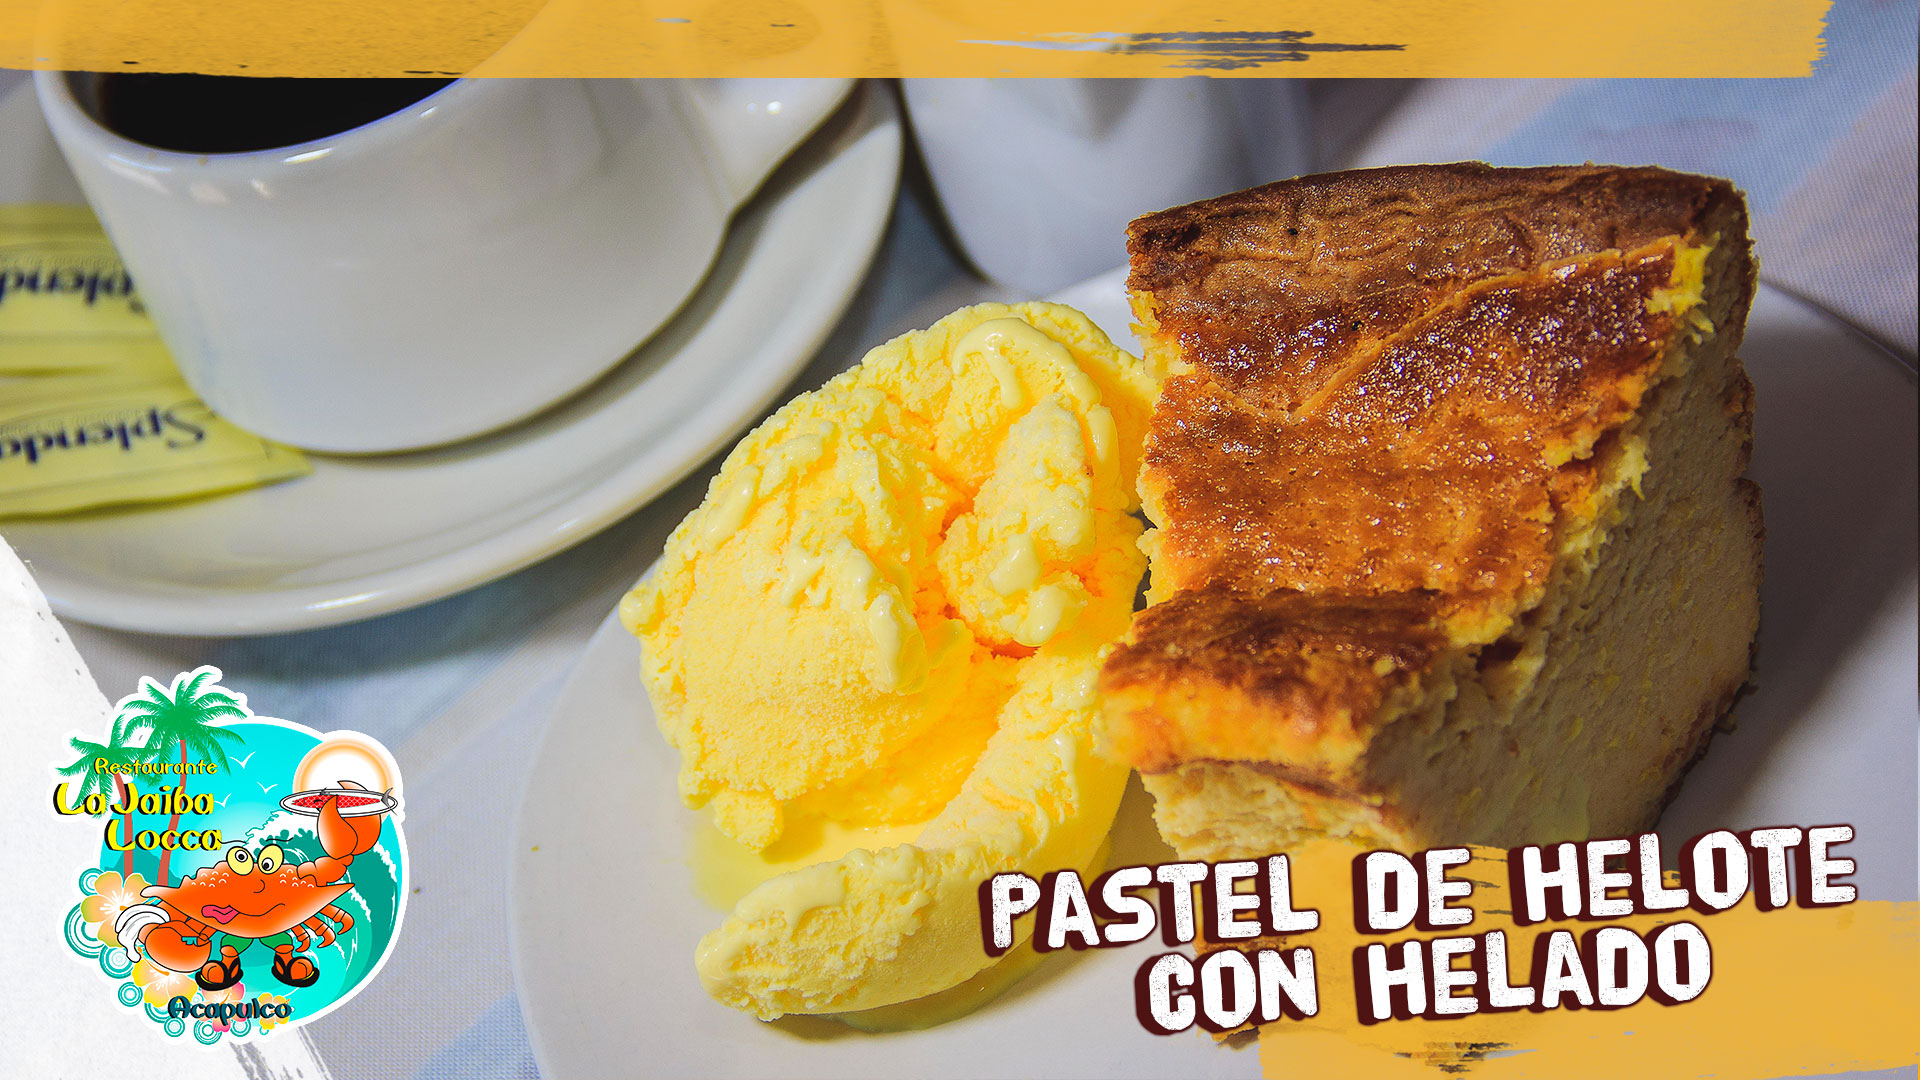 https://0201.nccdn.net/1_2/000/000/08e/afe/25-Pastel-de-helote-con-helado.jpg